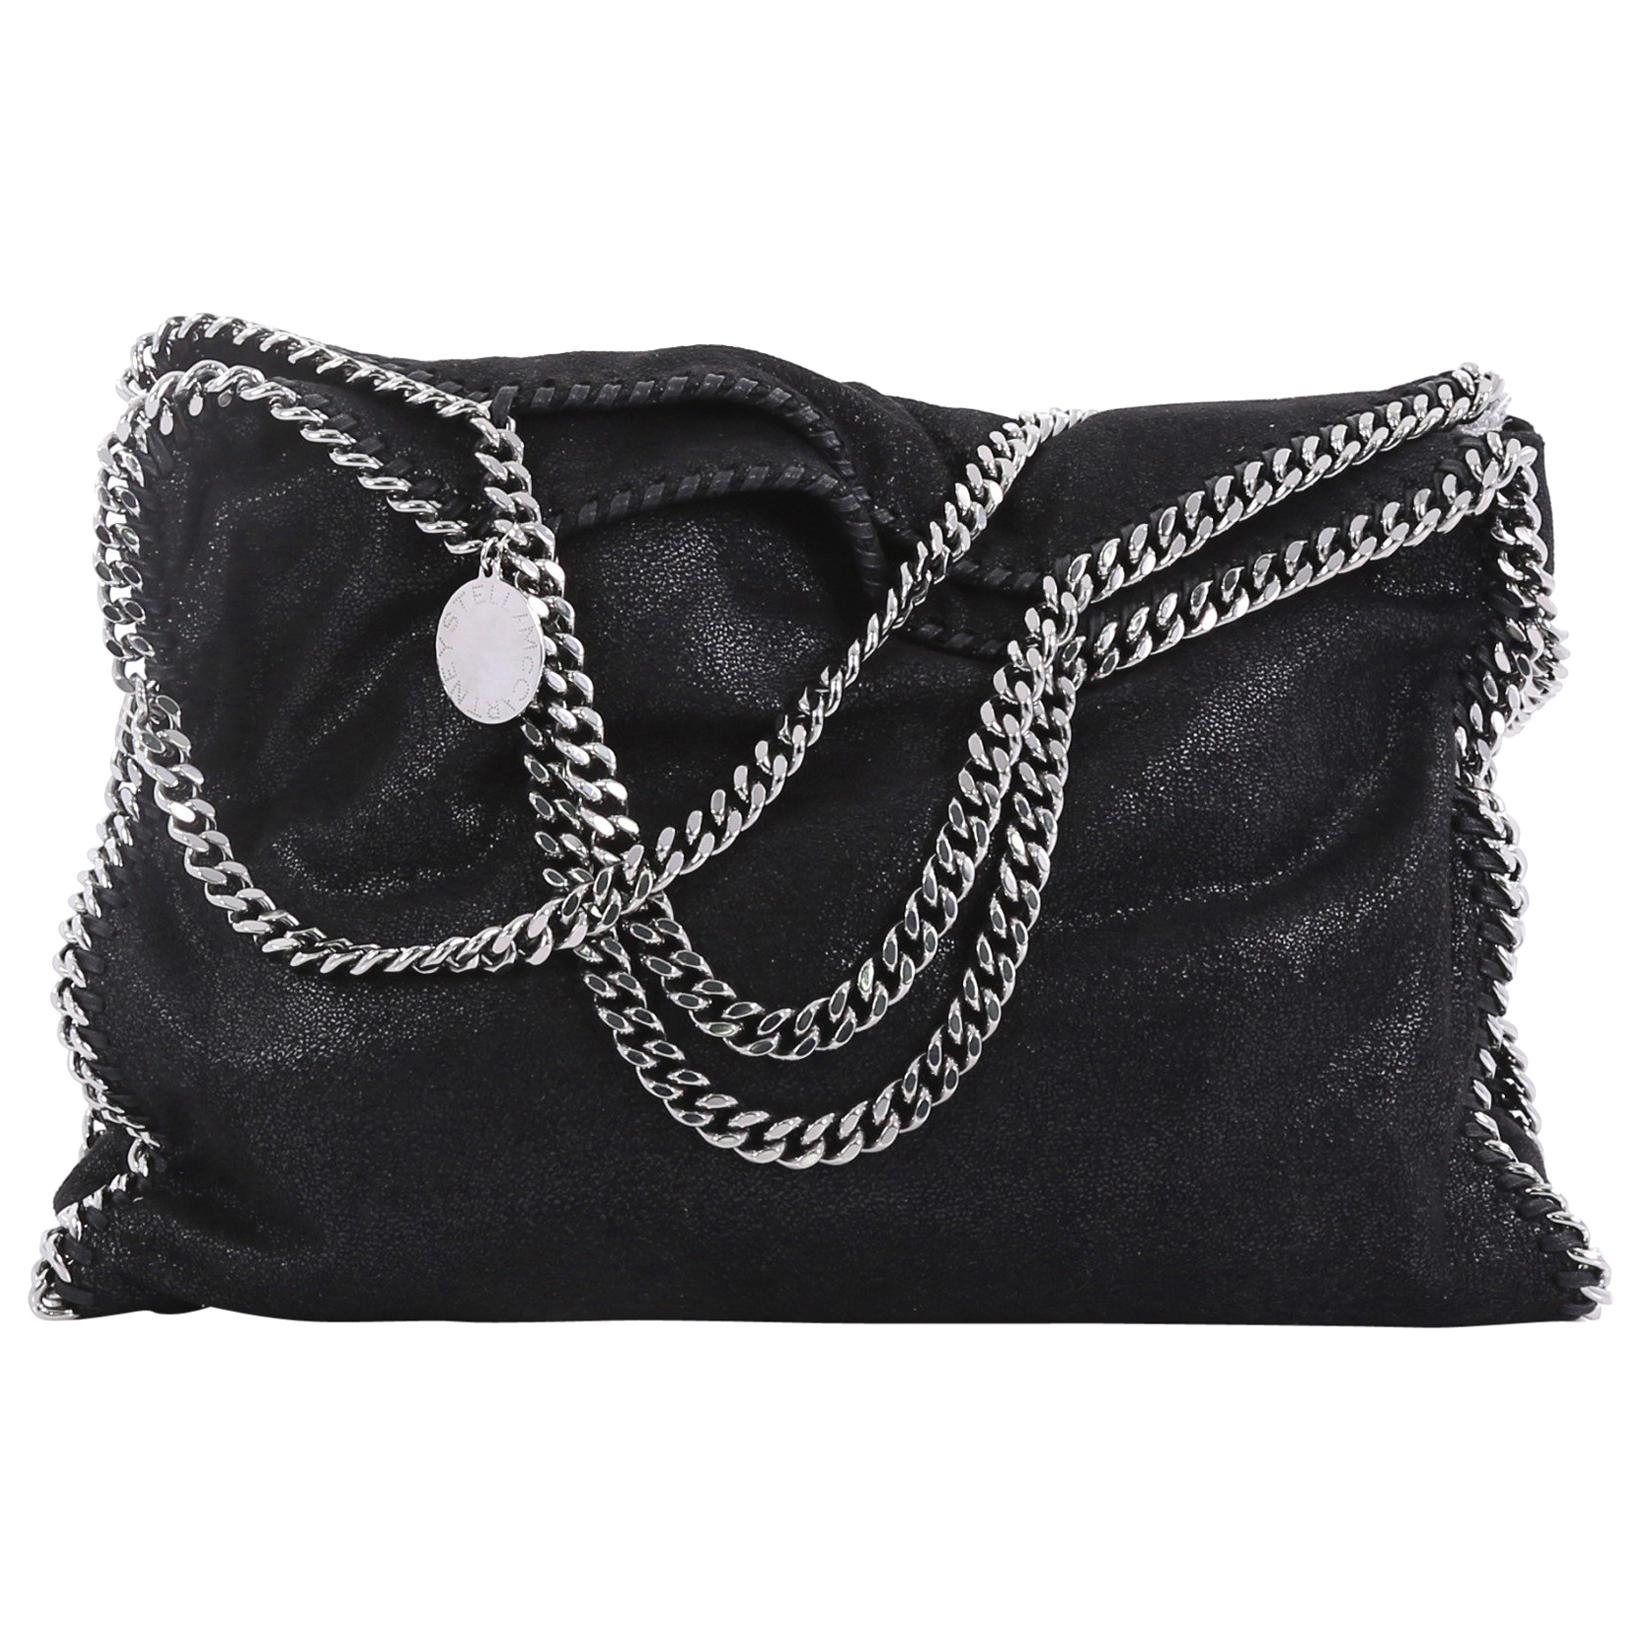 d4506beec5ab Rebag Handbags and Purses - 1stdibs - Page 21